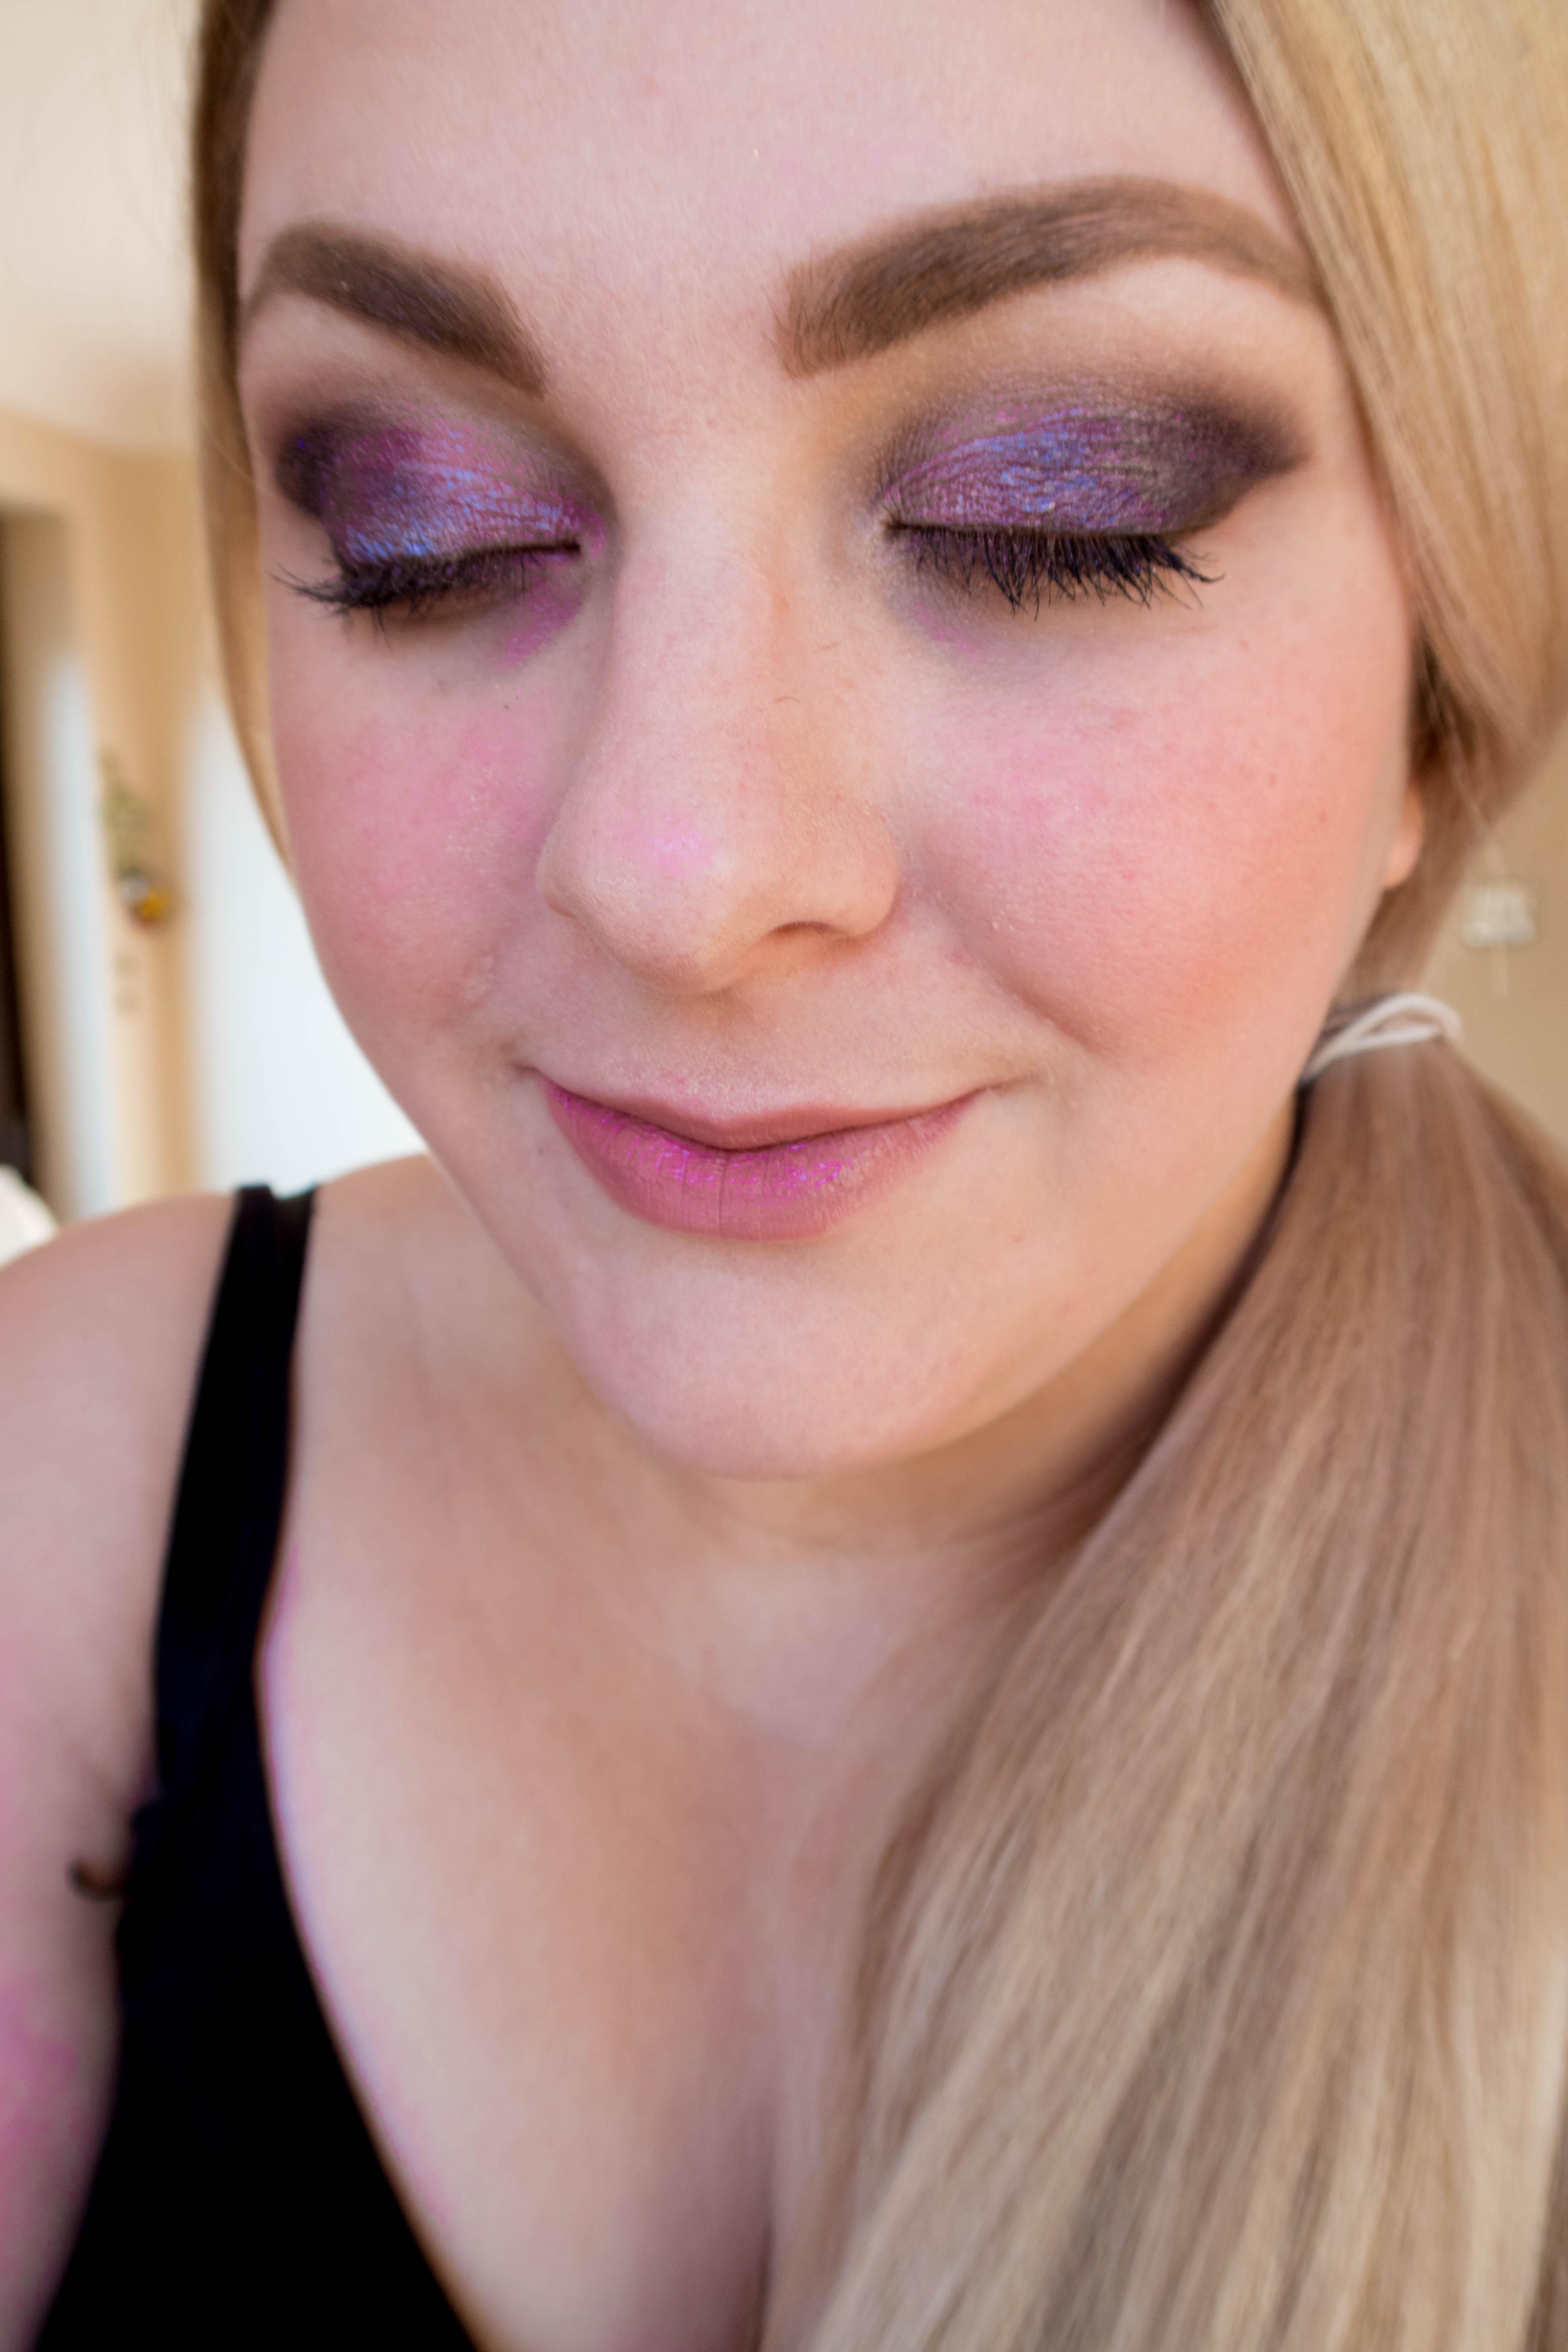 Barry M crushed jewel cream eyeshadow in a purple smokey eye look